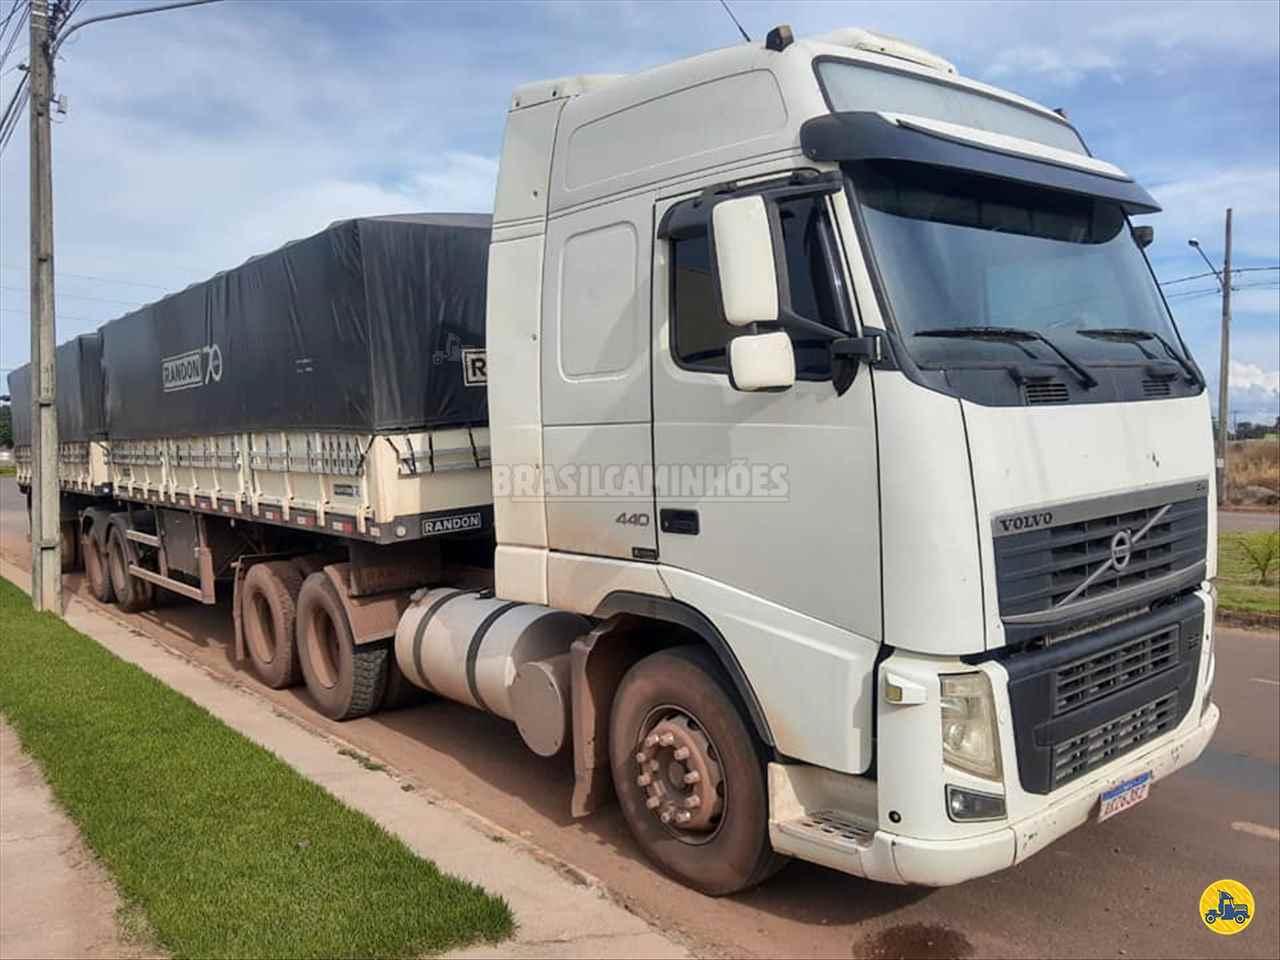 CAMINHAO VOLVO VOLVO FH 440 Cavalo Mecânico Truck 6x2 Brasil Caminhões Sinop SINOP MATO GROSSO MT